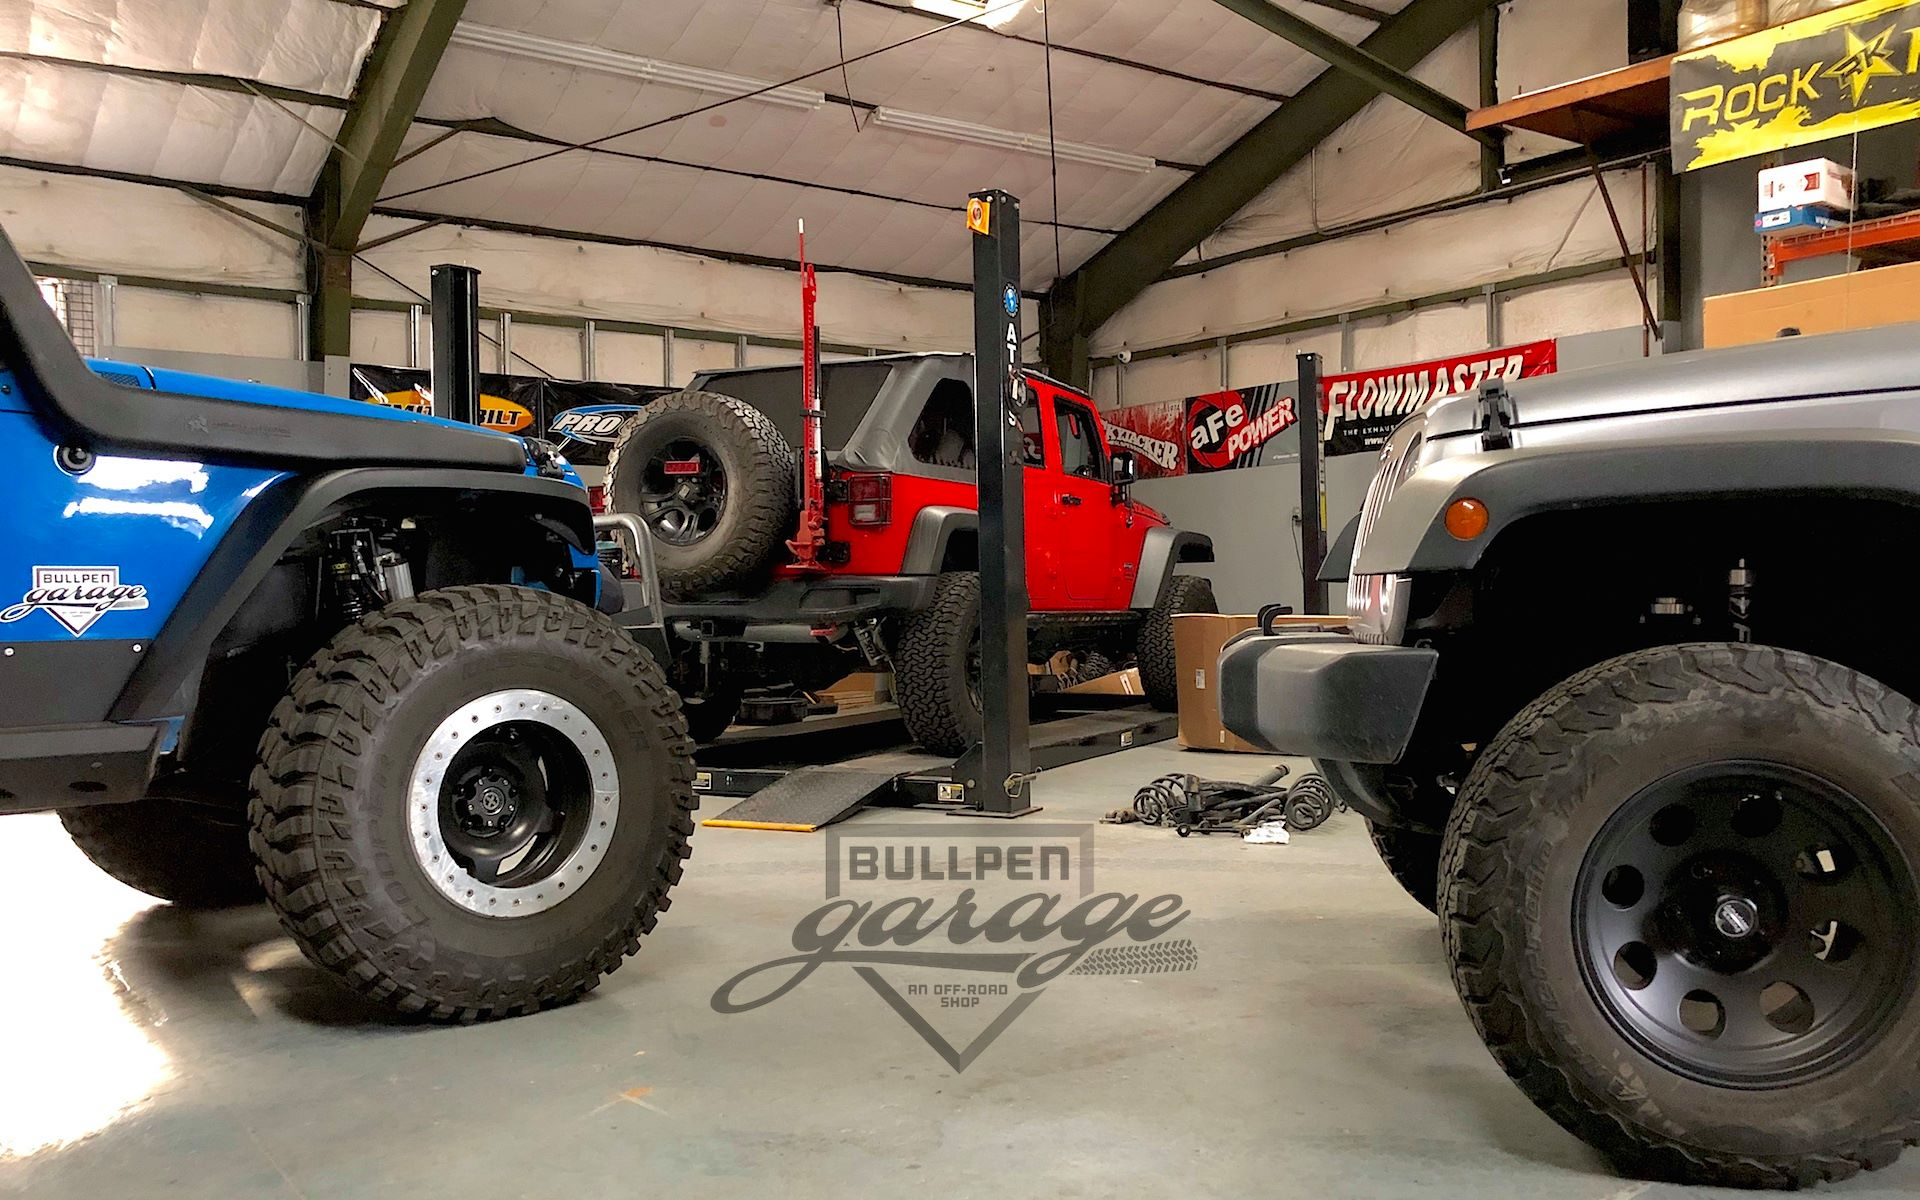 Jeep at Bullpen Garage